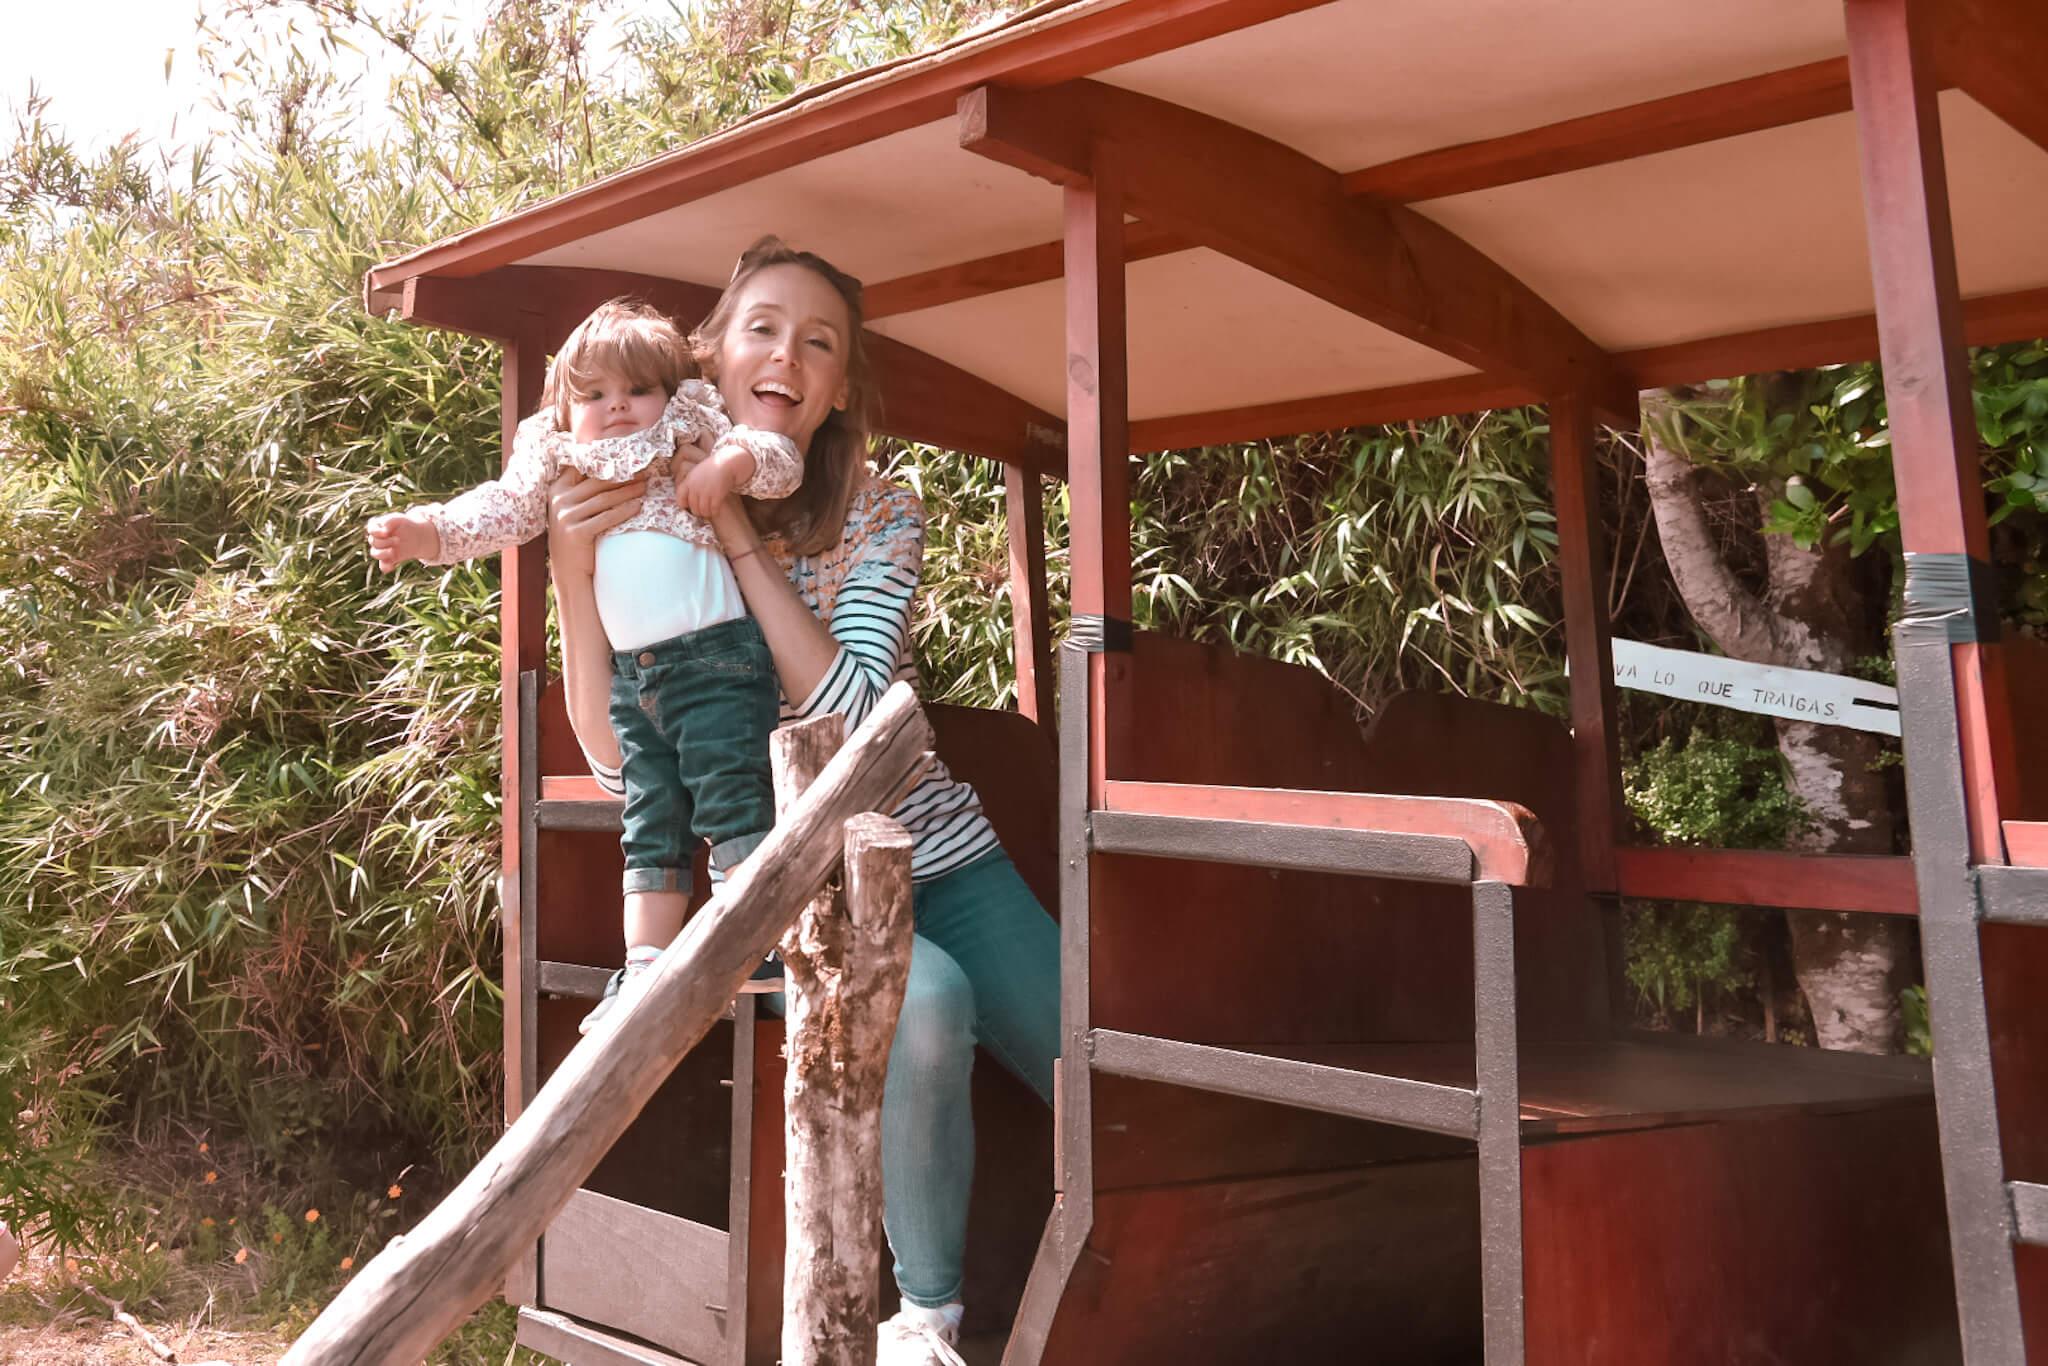 wooden train for children in Chile